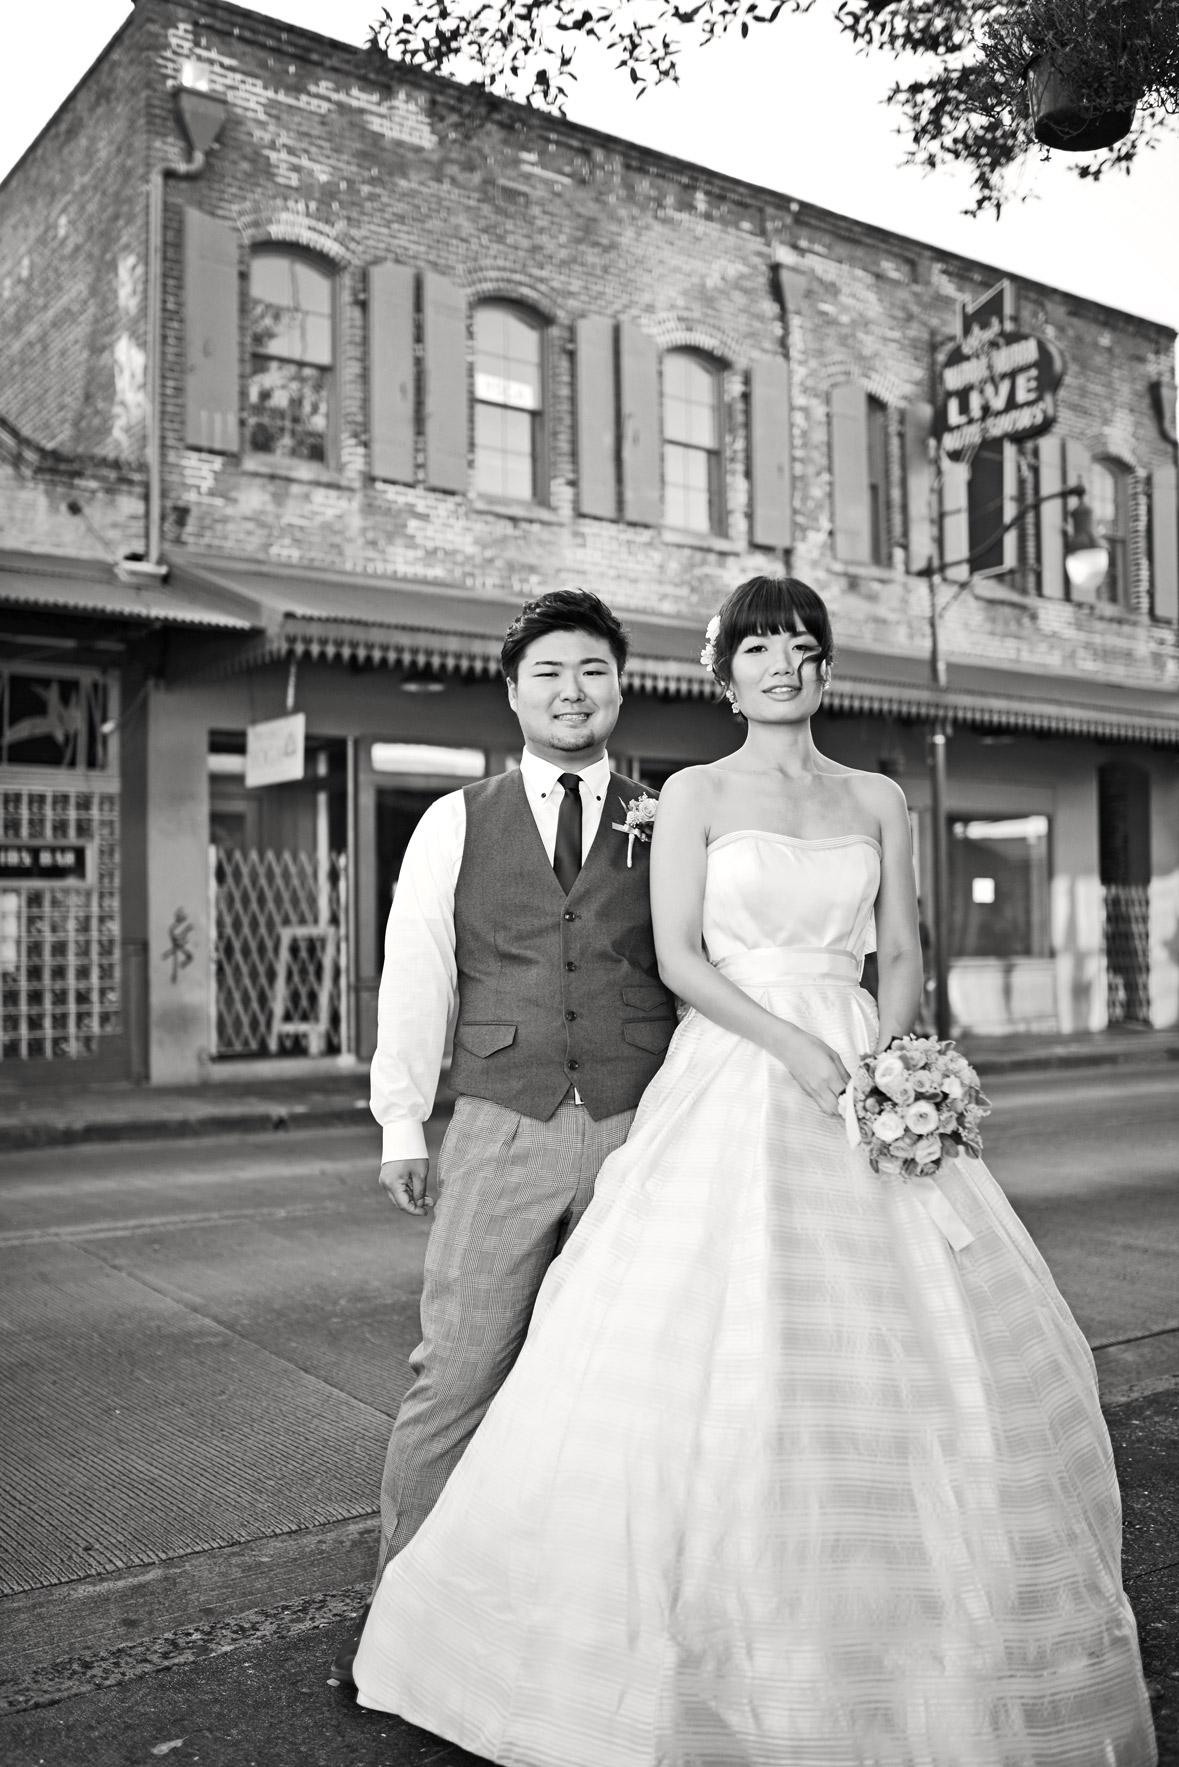 waikiki-beach-wedding-and-downtown-honolulu-hawaii-theater-stephen-ludwig-photography087.jpg